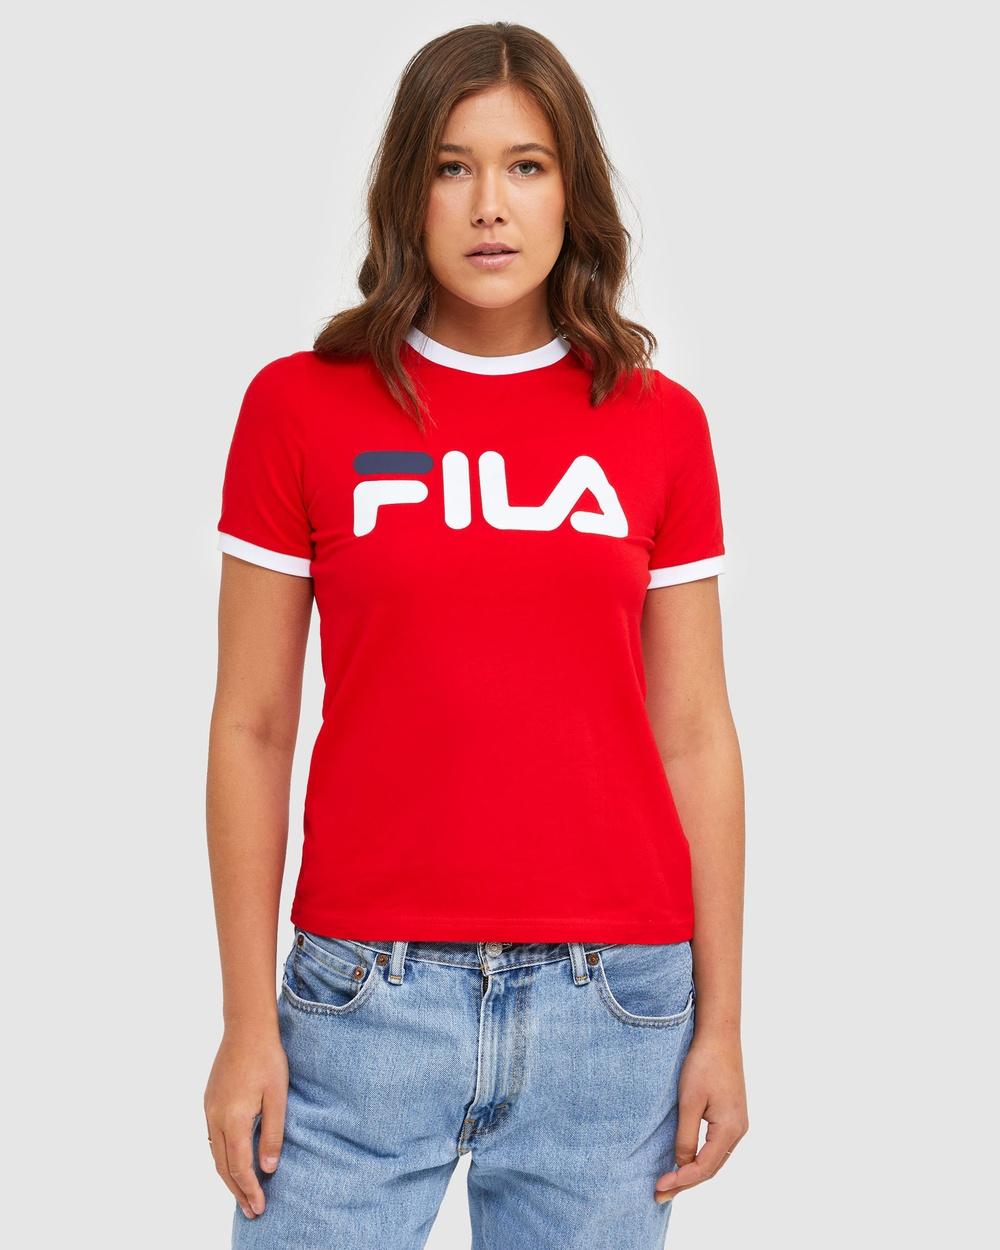 Fila Classic Ringer Tee T-Shirts & Singlets Red Australia